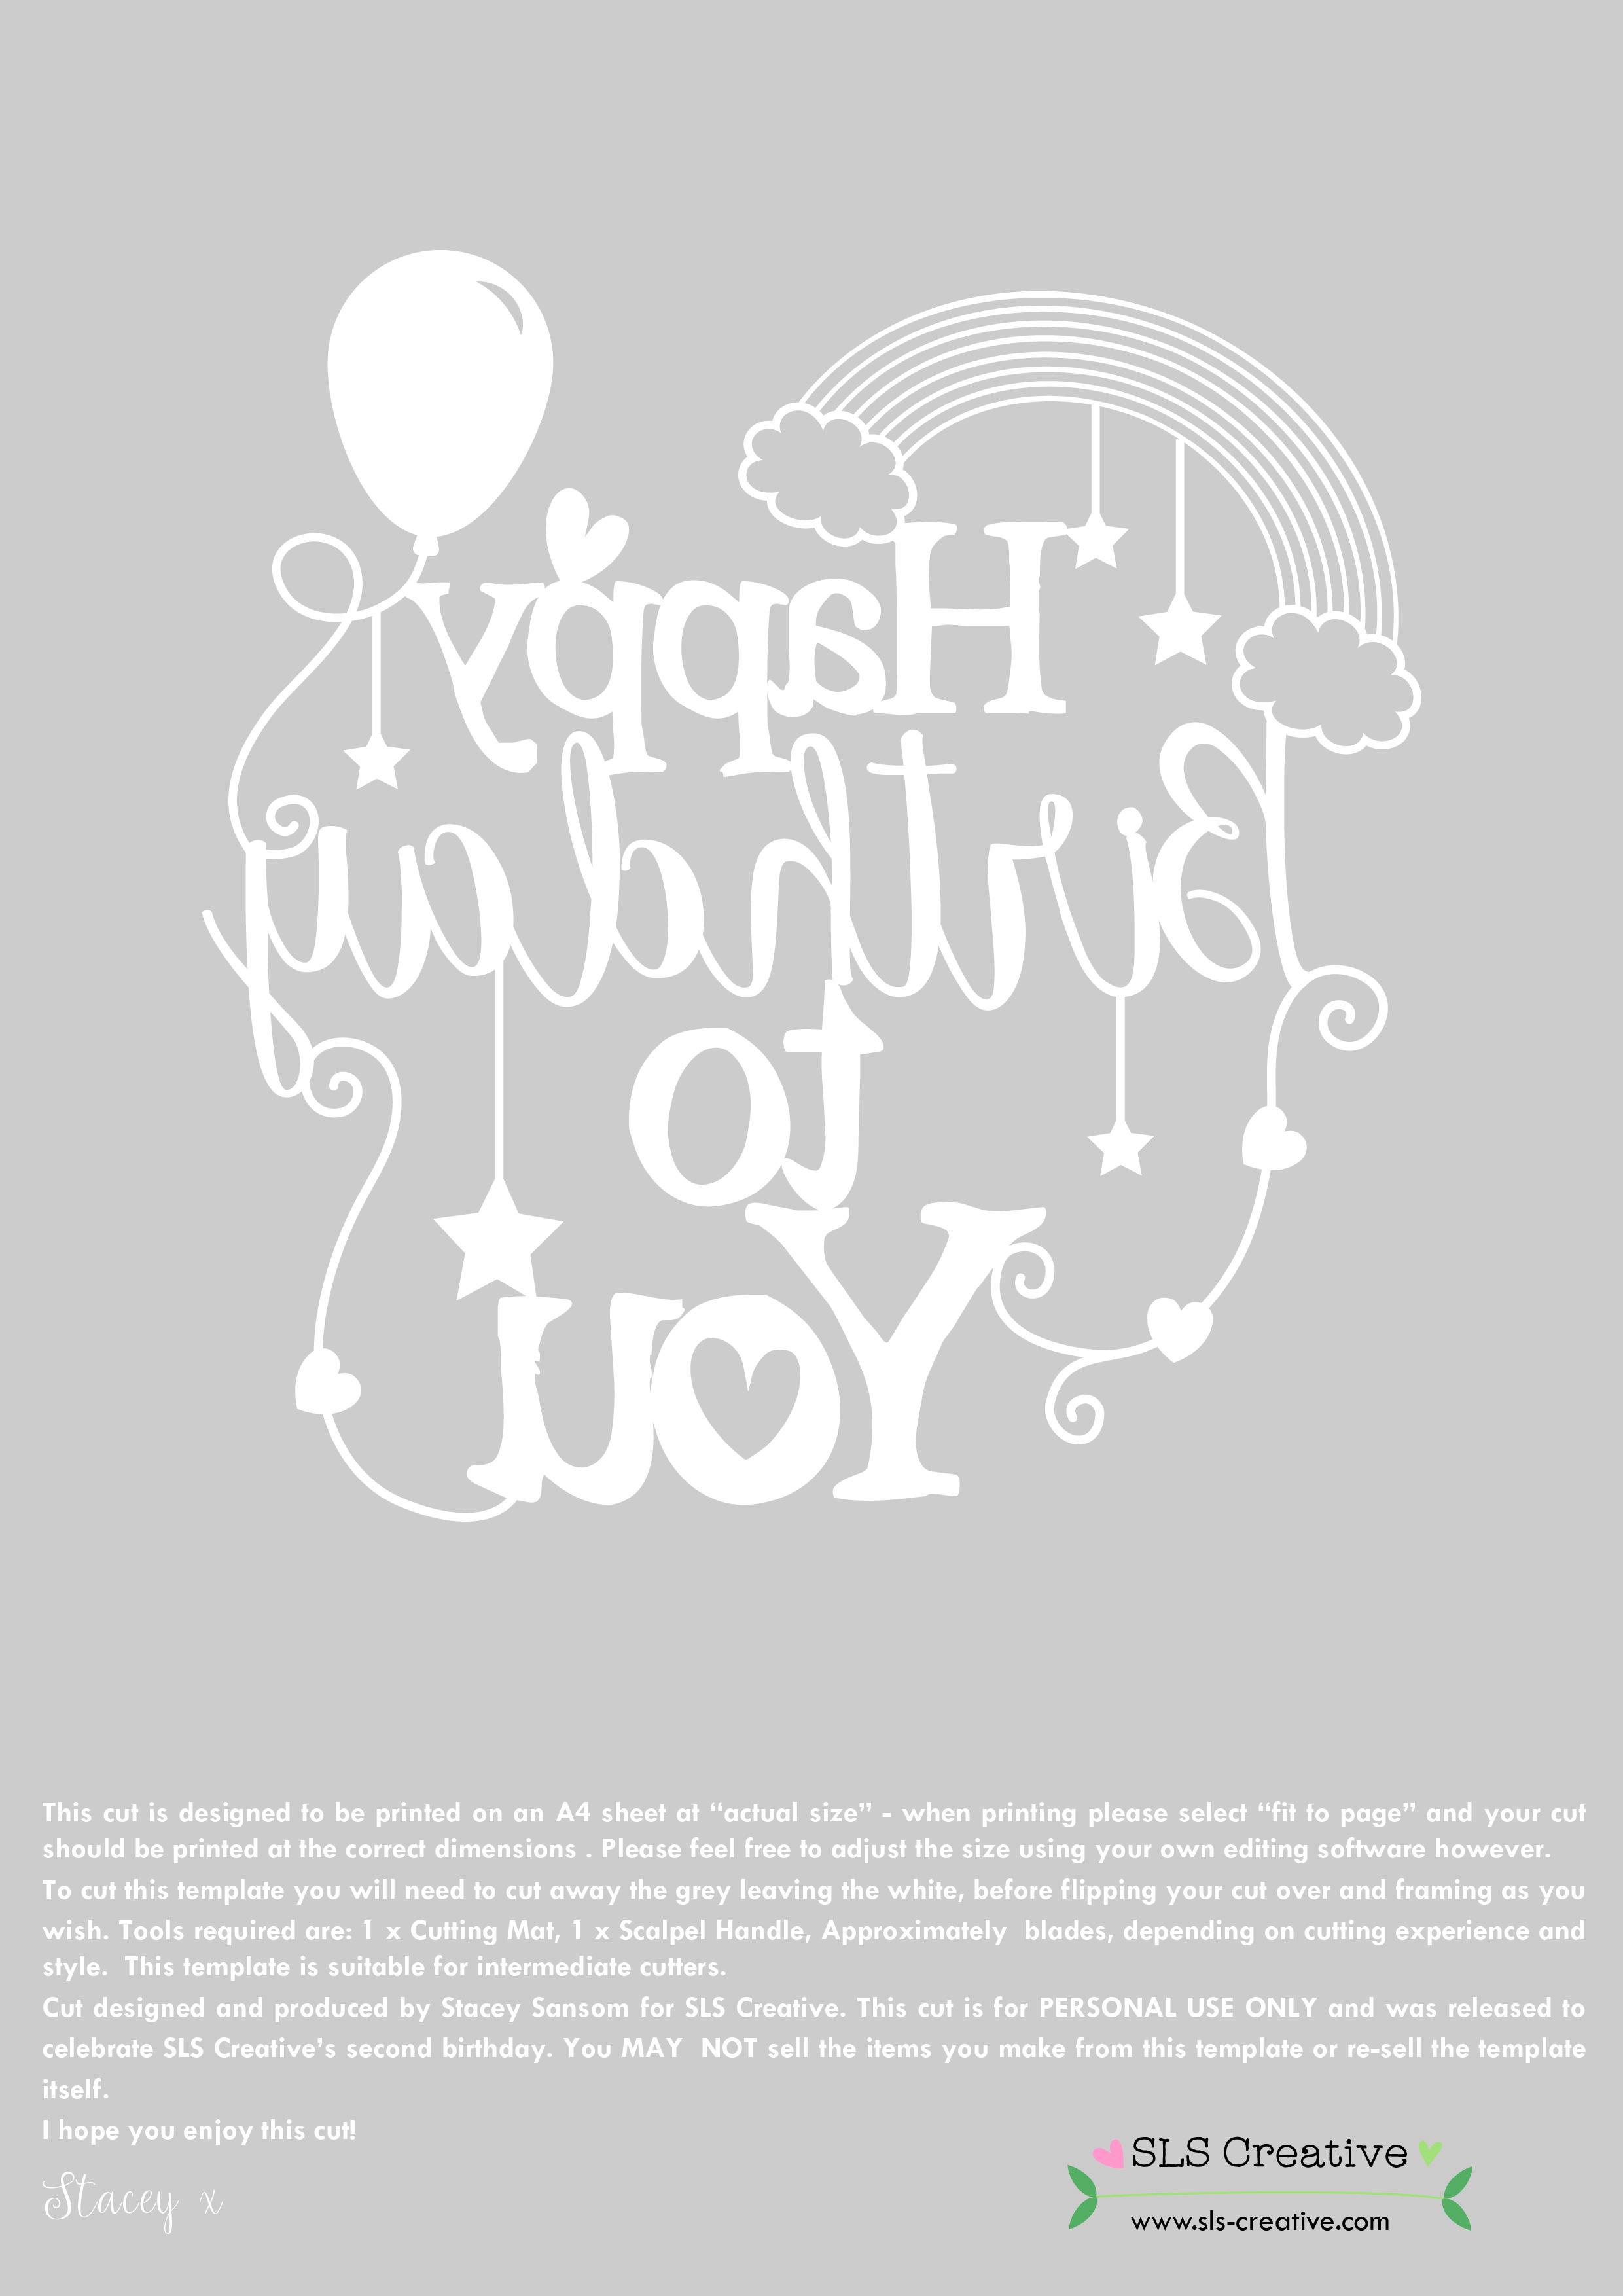 Happy 2nd Birthday SLS Creative! (& Free Paper Cutting Template ...